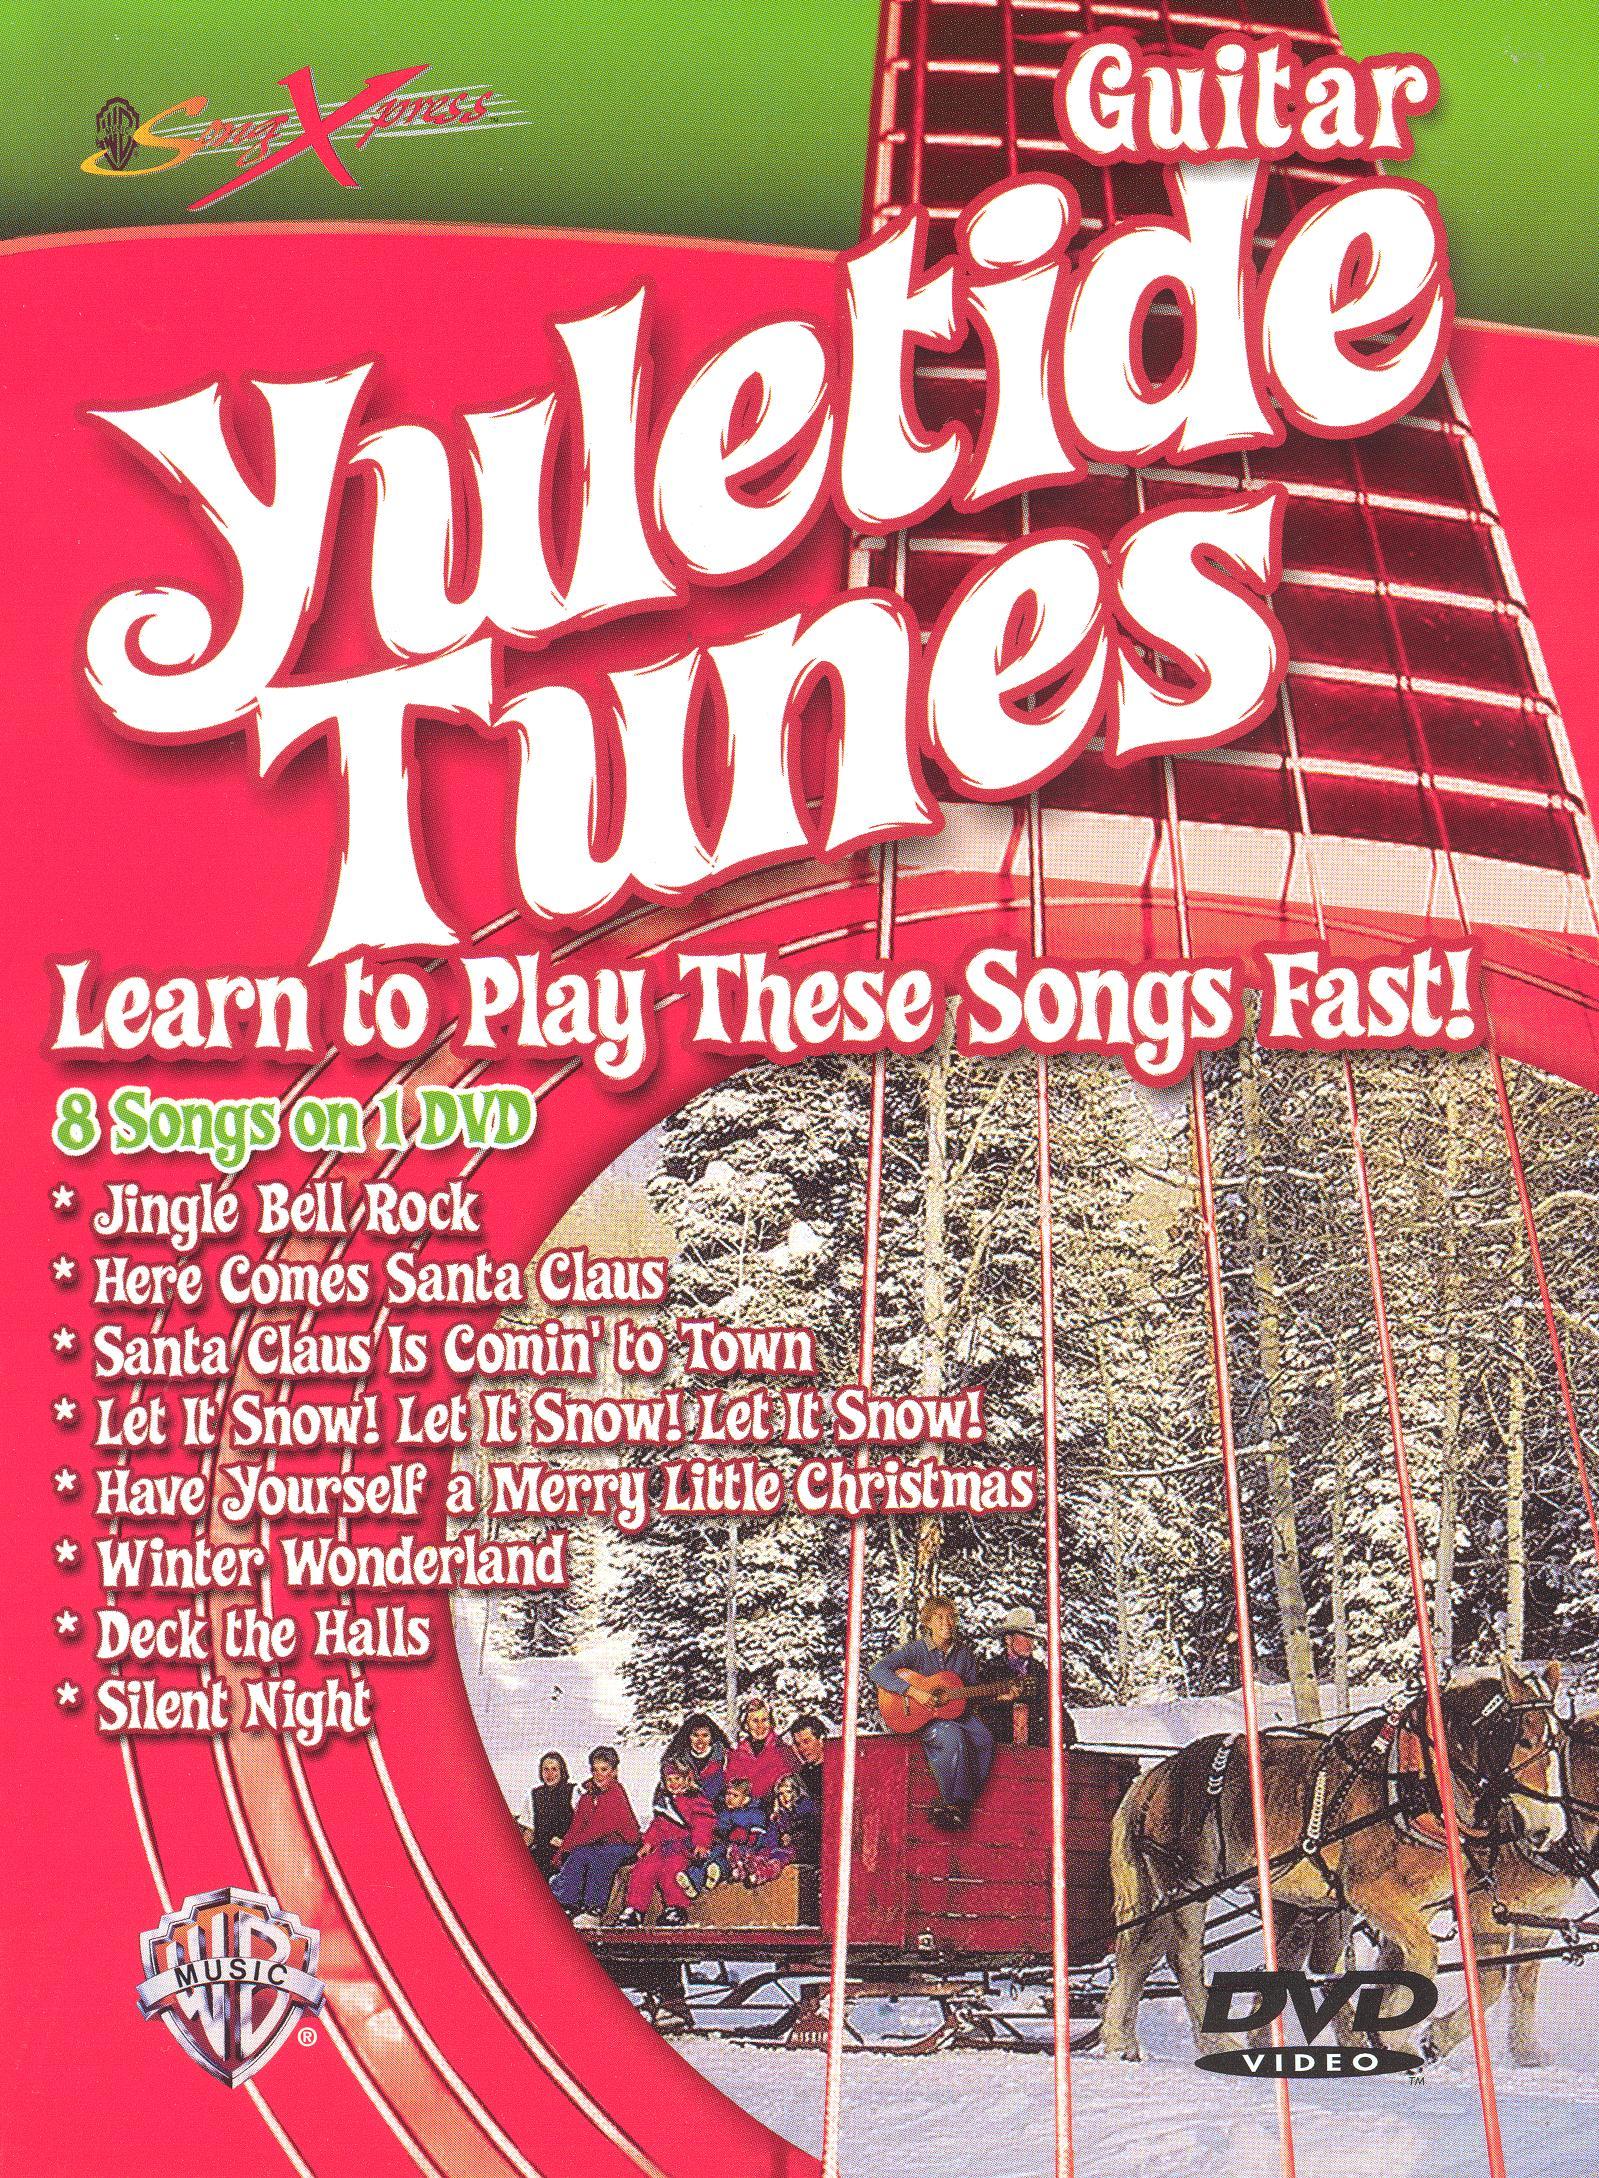 Guitar Yuletide Tunes